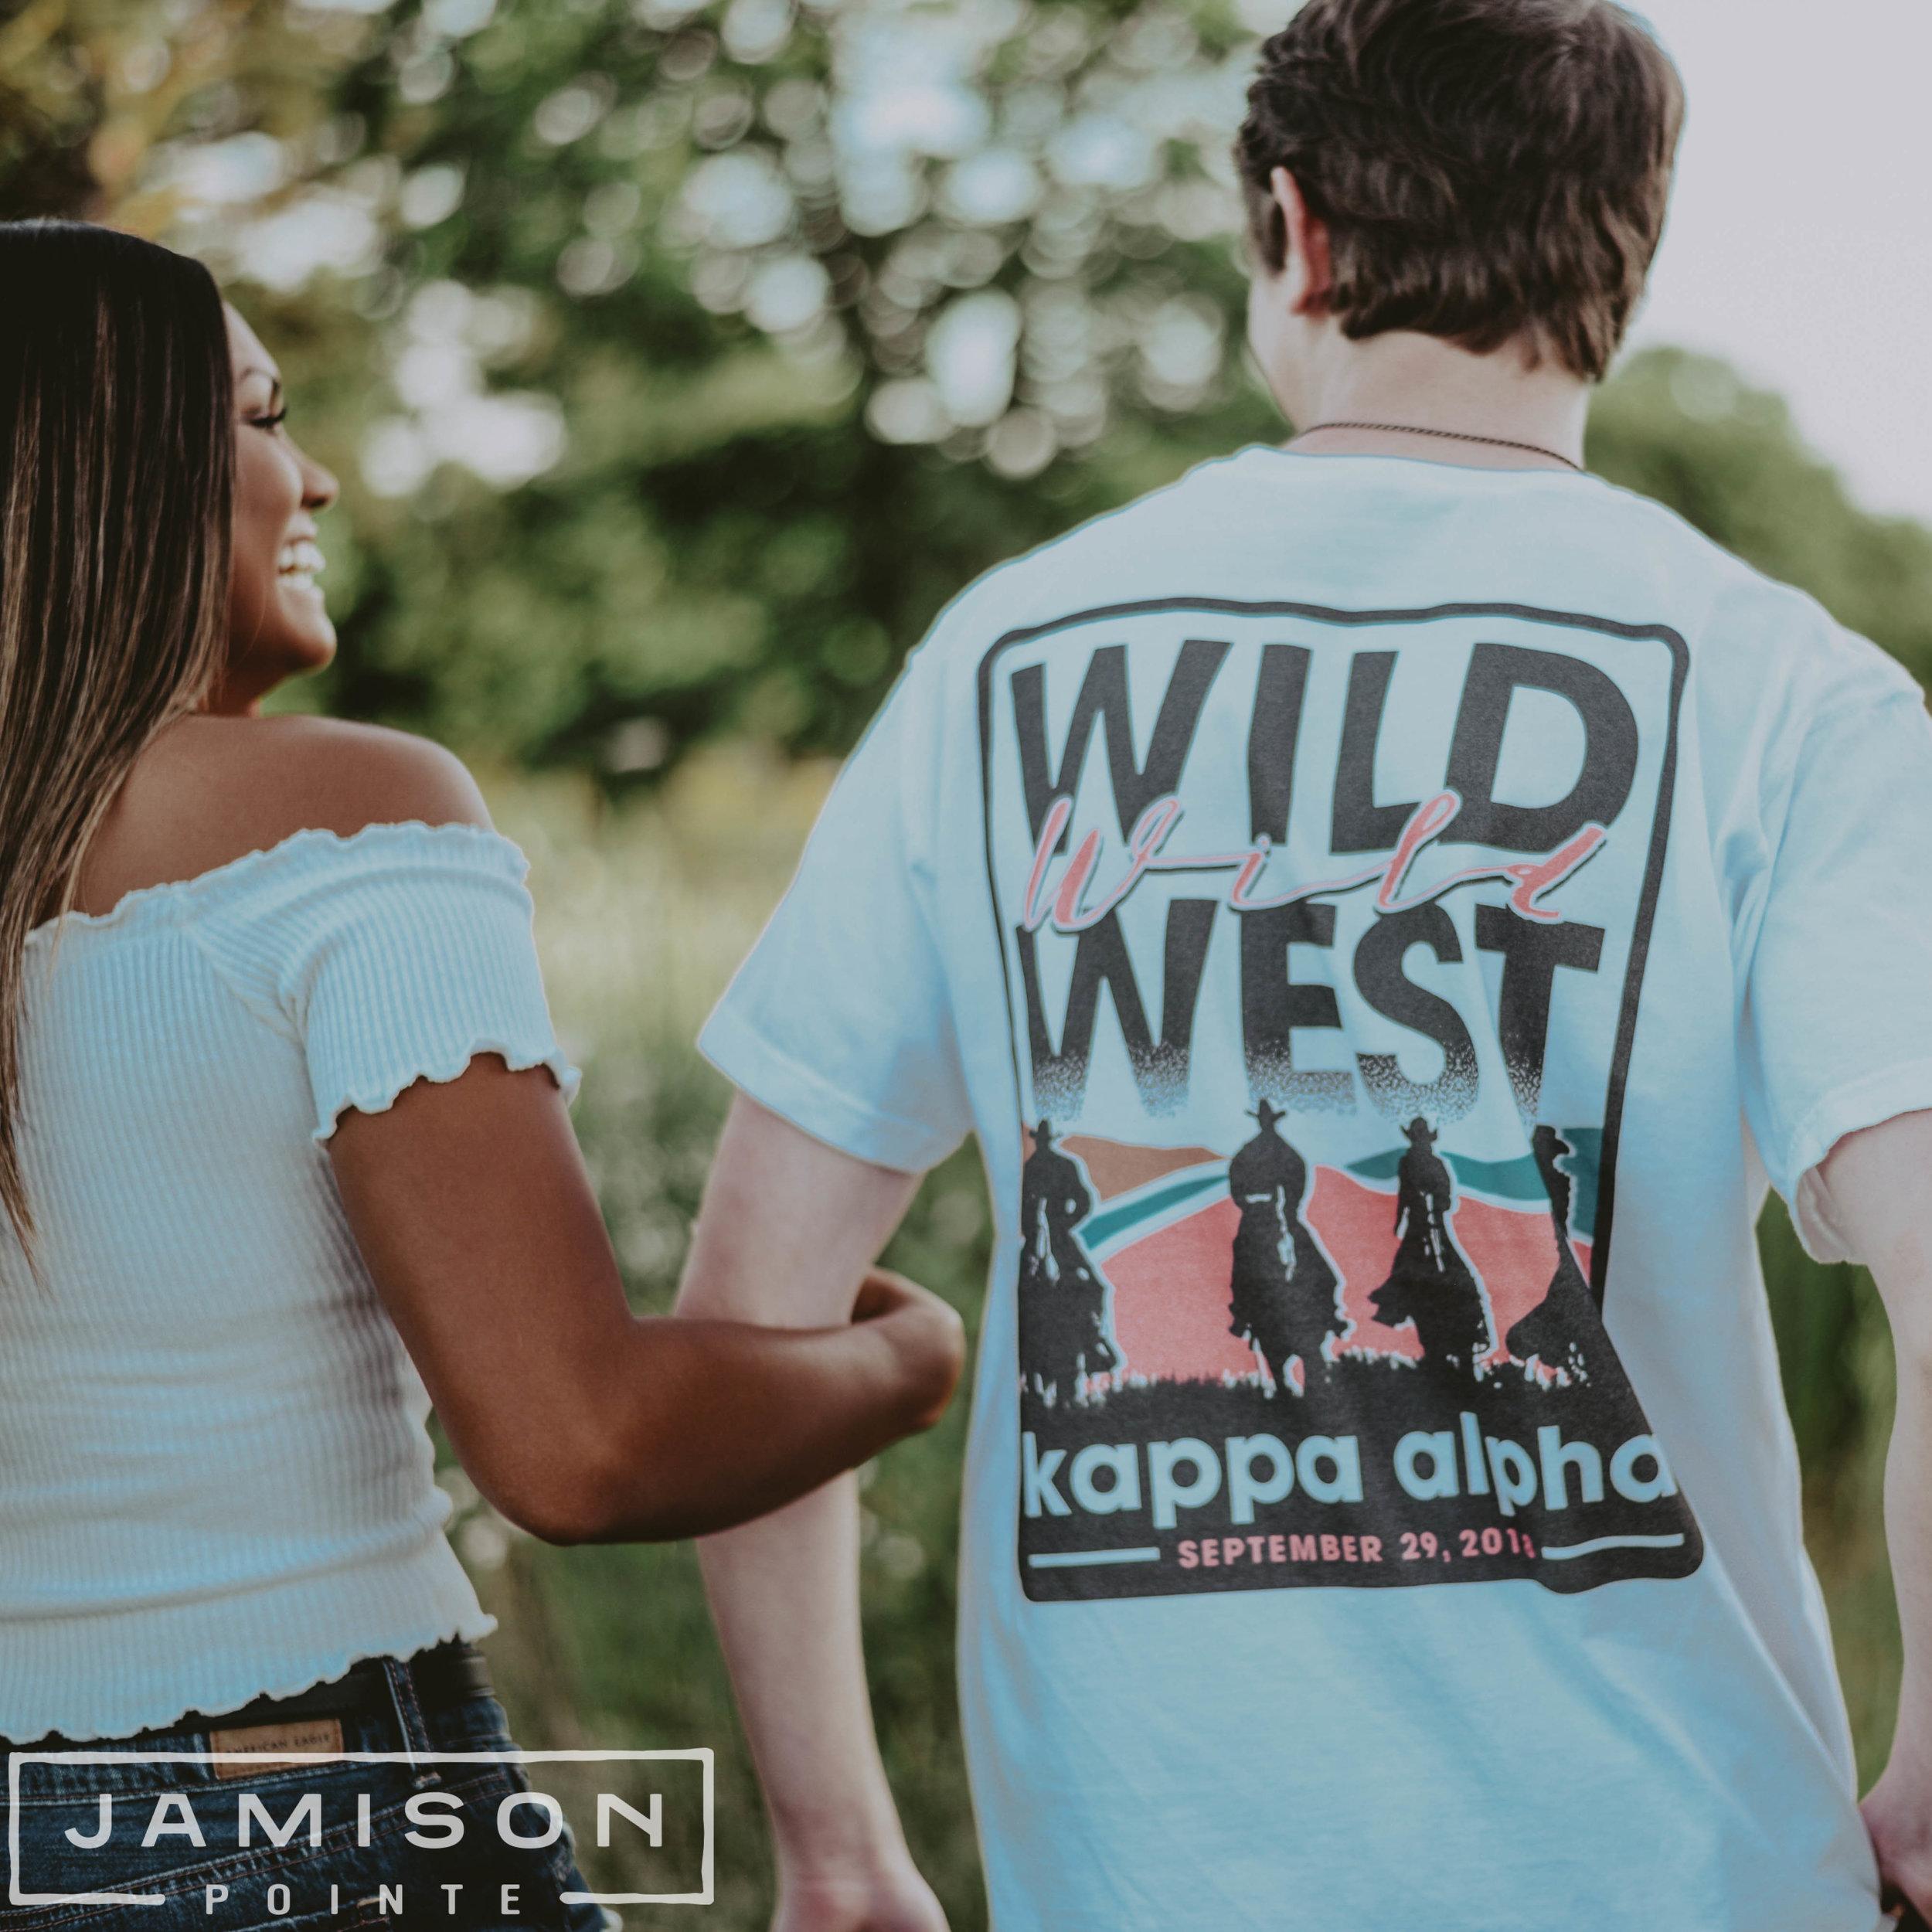 Kappa Alpha Wild West T-shirt